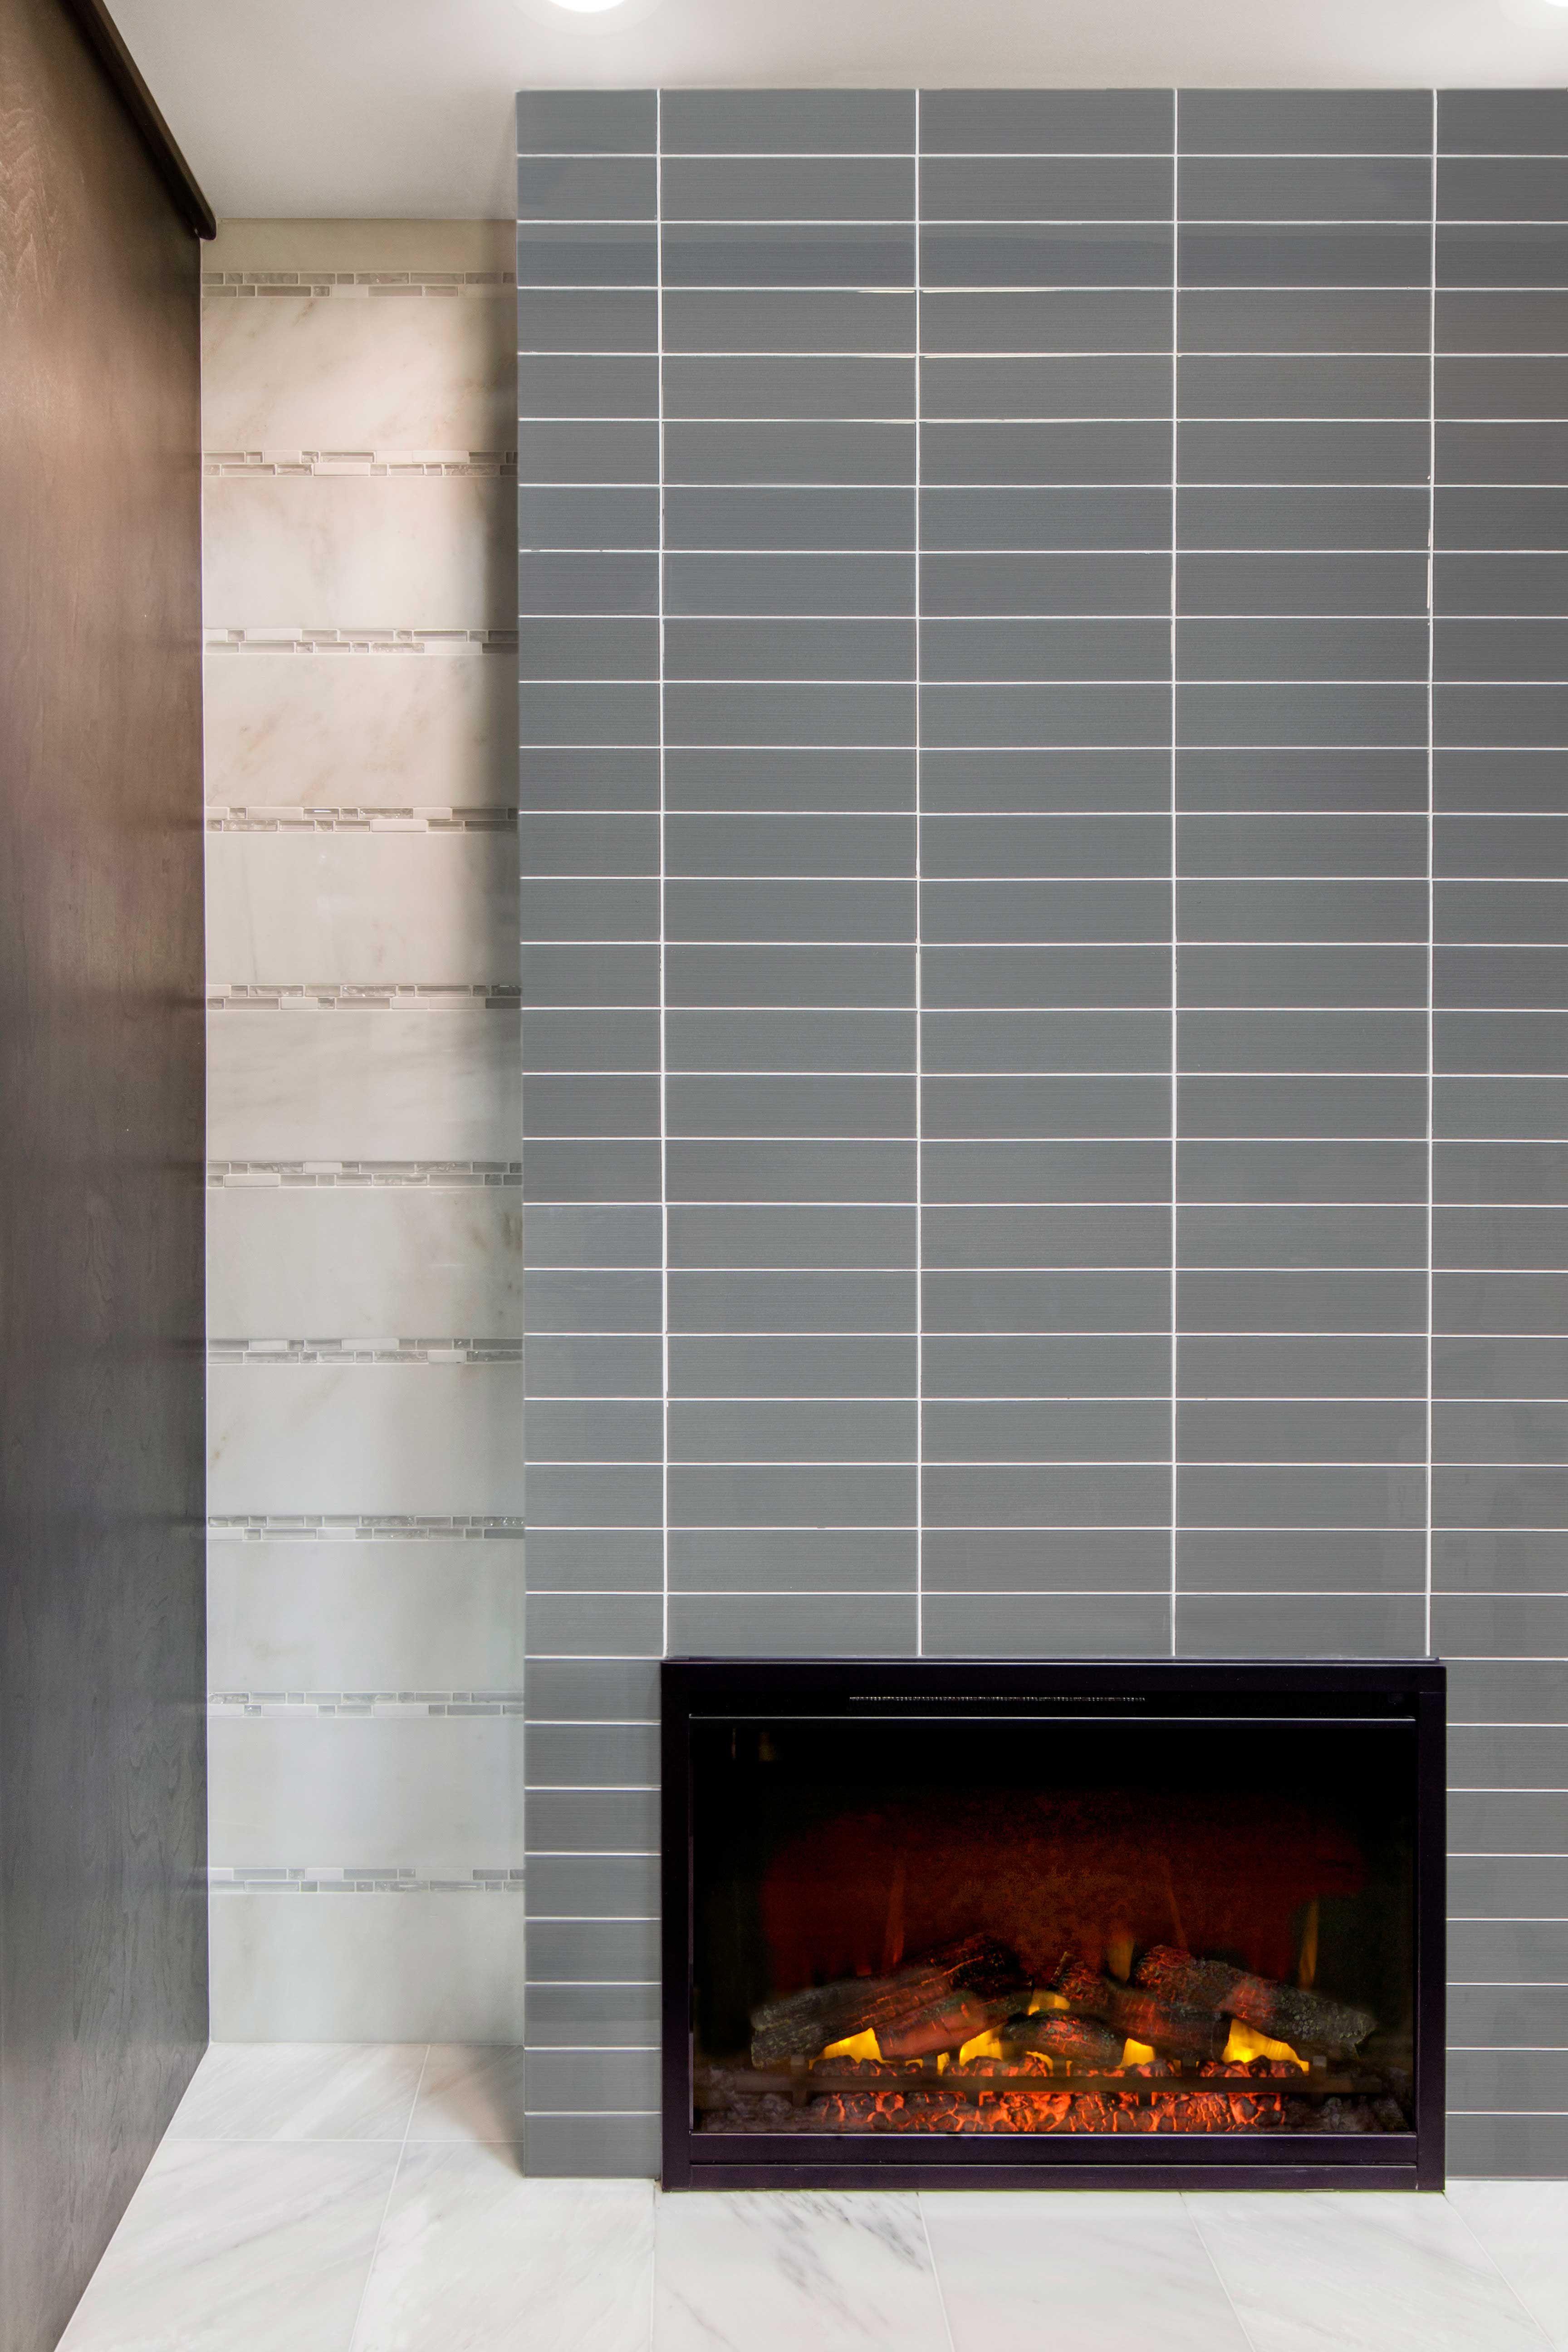 Transitional Or Modern Design Fireplace Tile Lasalle Glass Subway Tile Subway Tile Fireplace Fireplace Tile Tile Around Fireplace